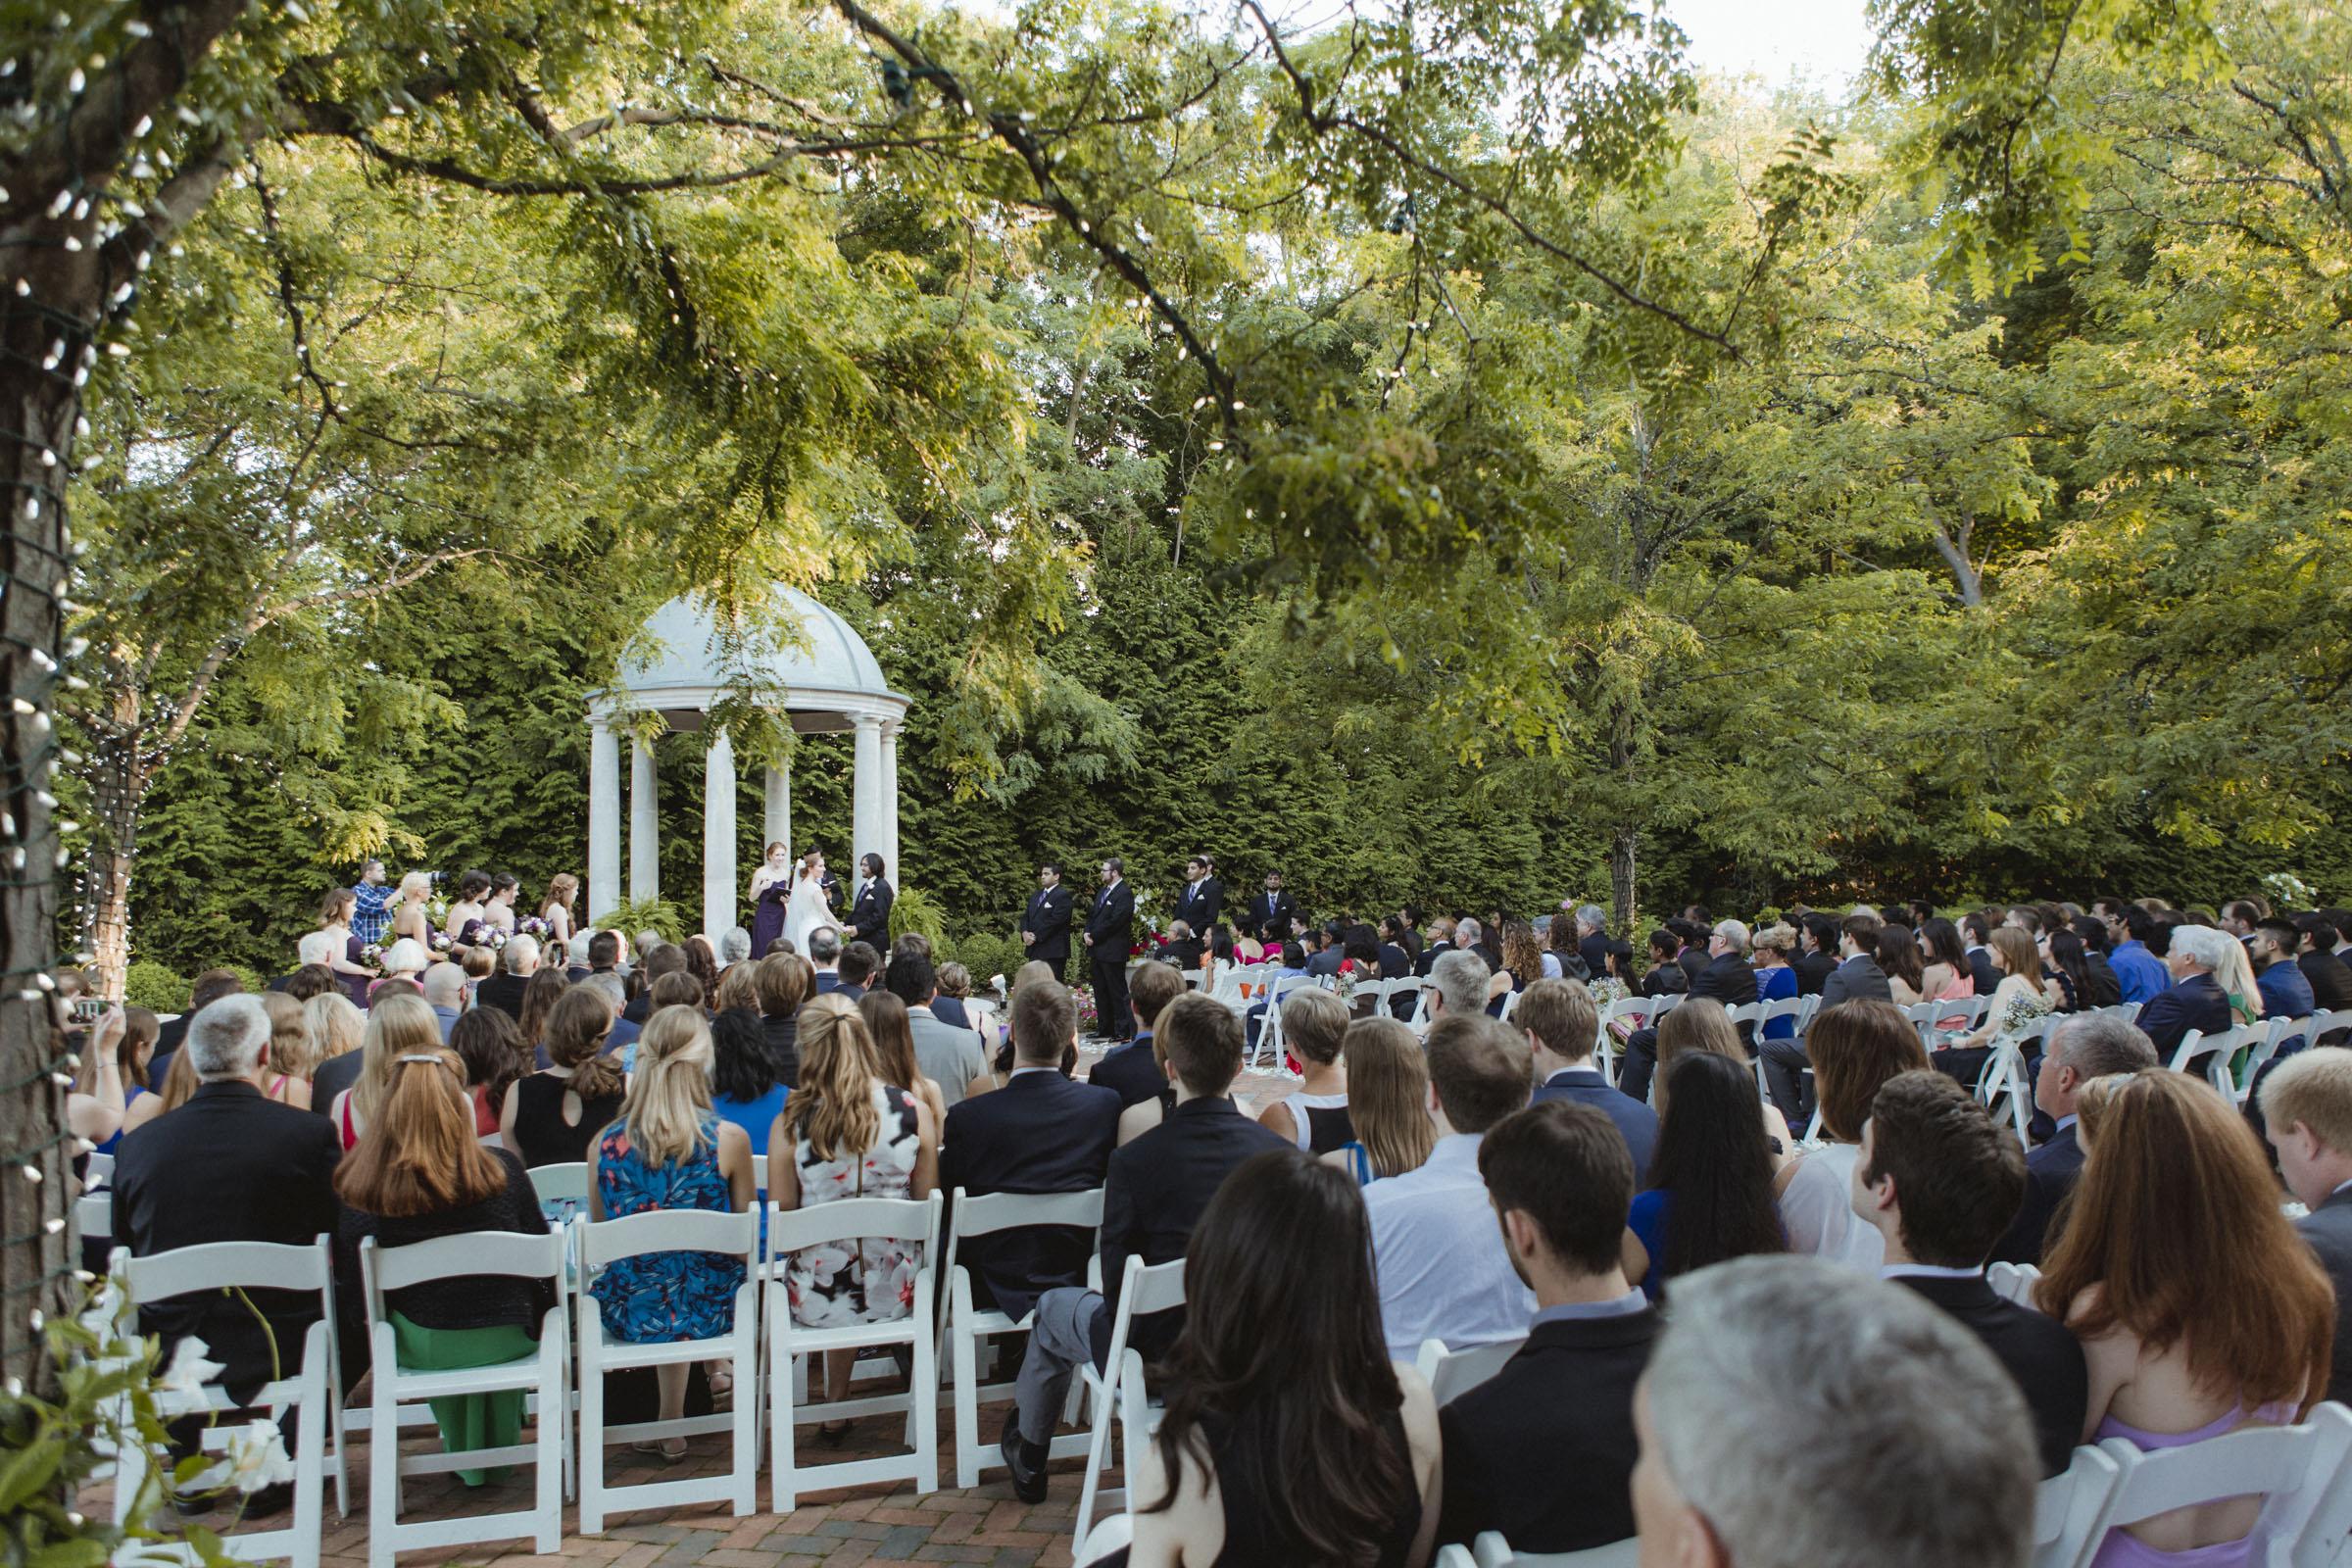 Wide shot of ceremony - Estate at Florentine Gardens wedding - Hudson Valley Wedding - Kelsey & Anish's wedding - Amy Sims Photography